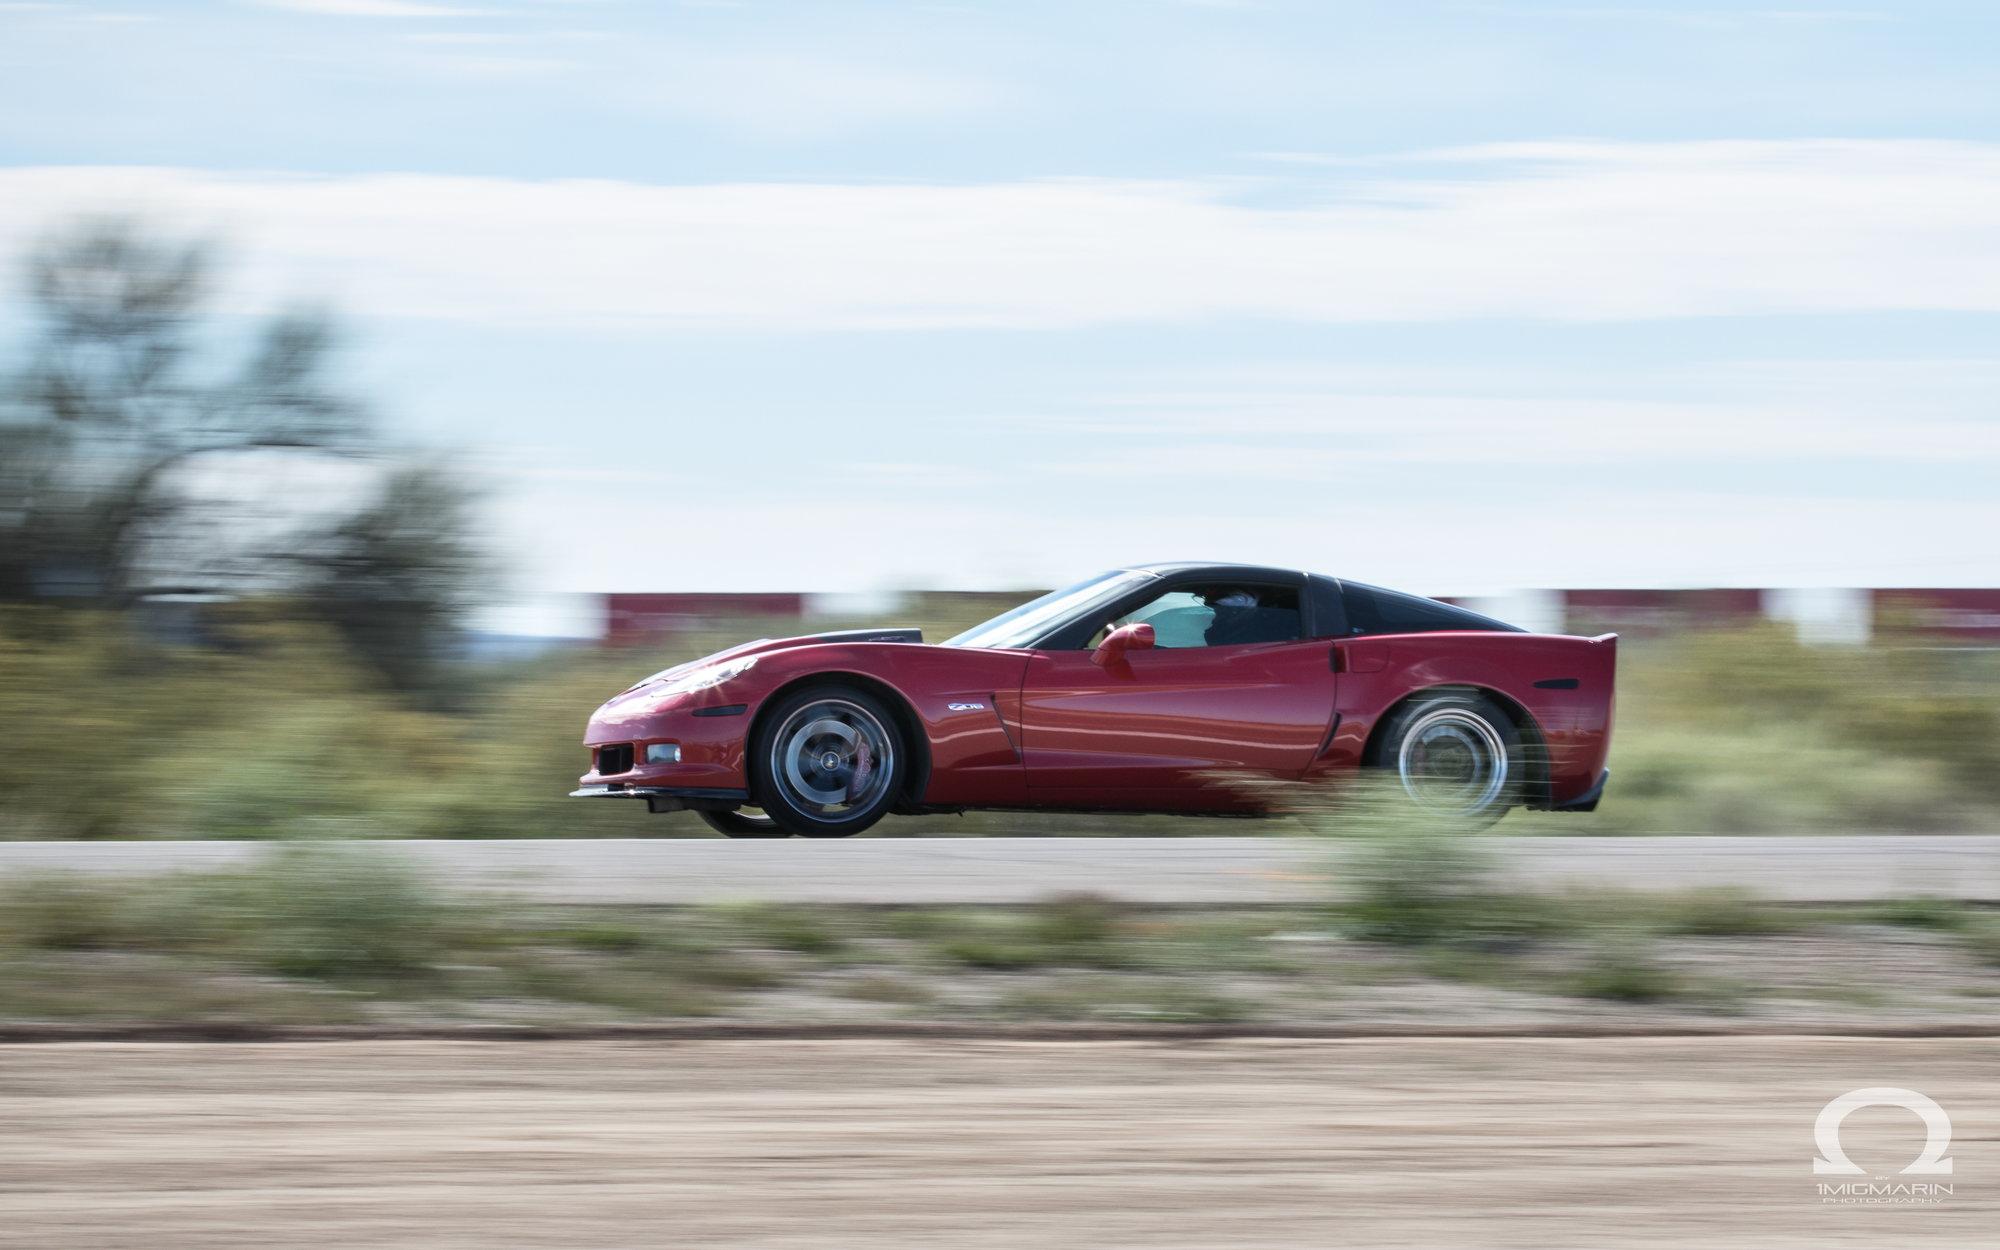 Z06 C6 Z06 1 2 mile times CorvetteForum Chevrolet Corvette Forum